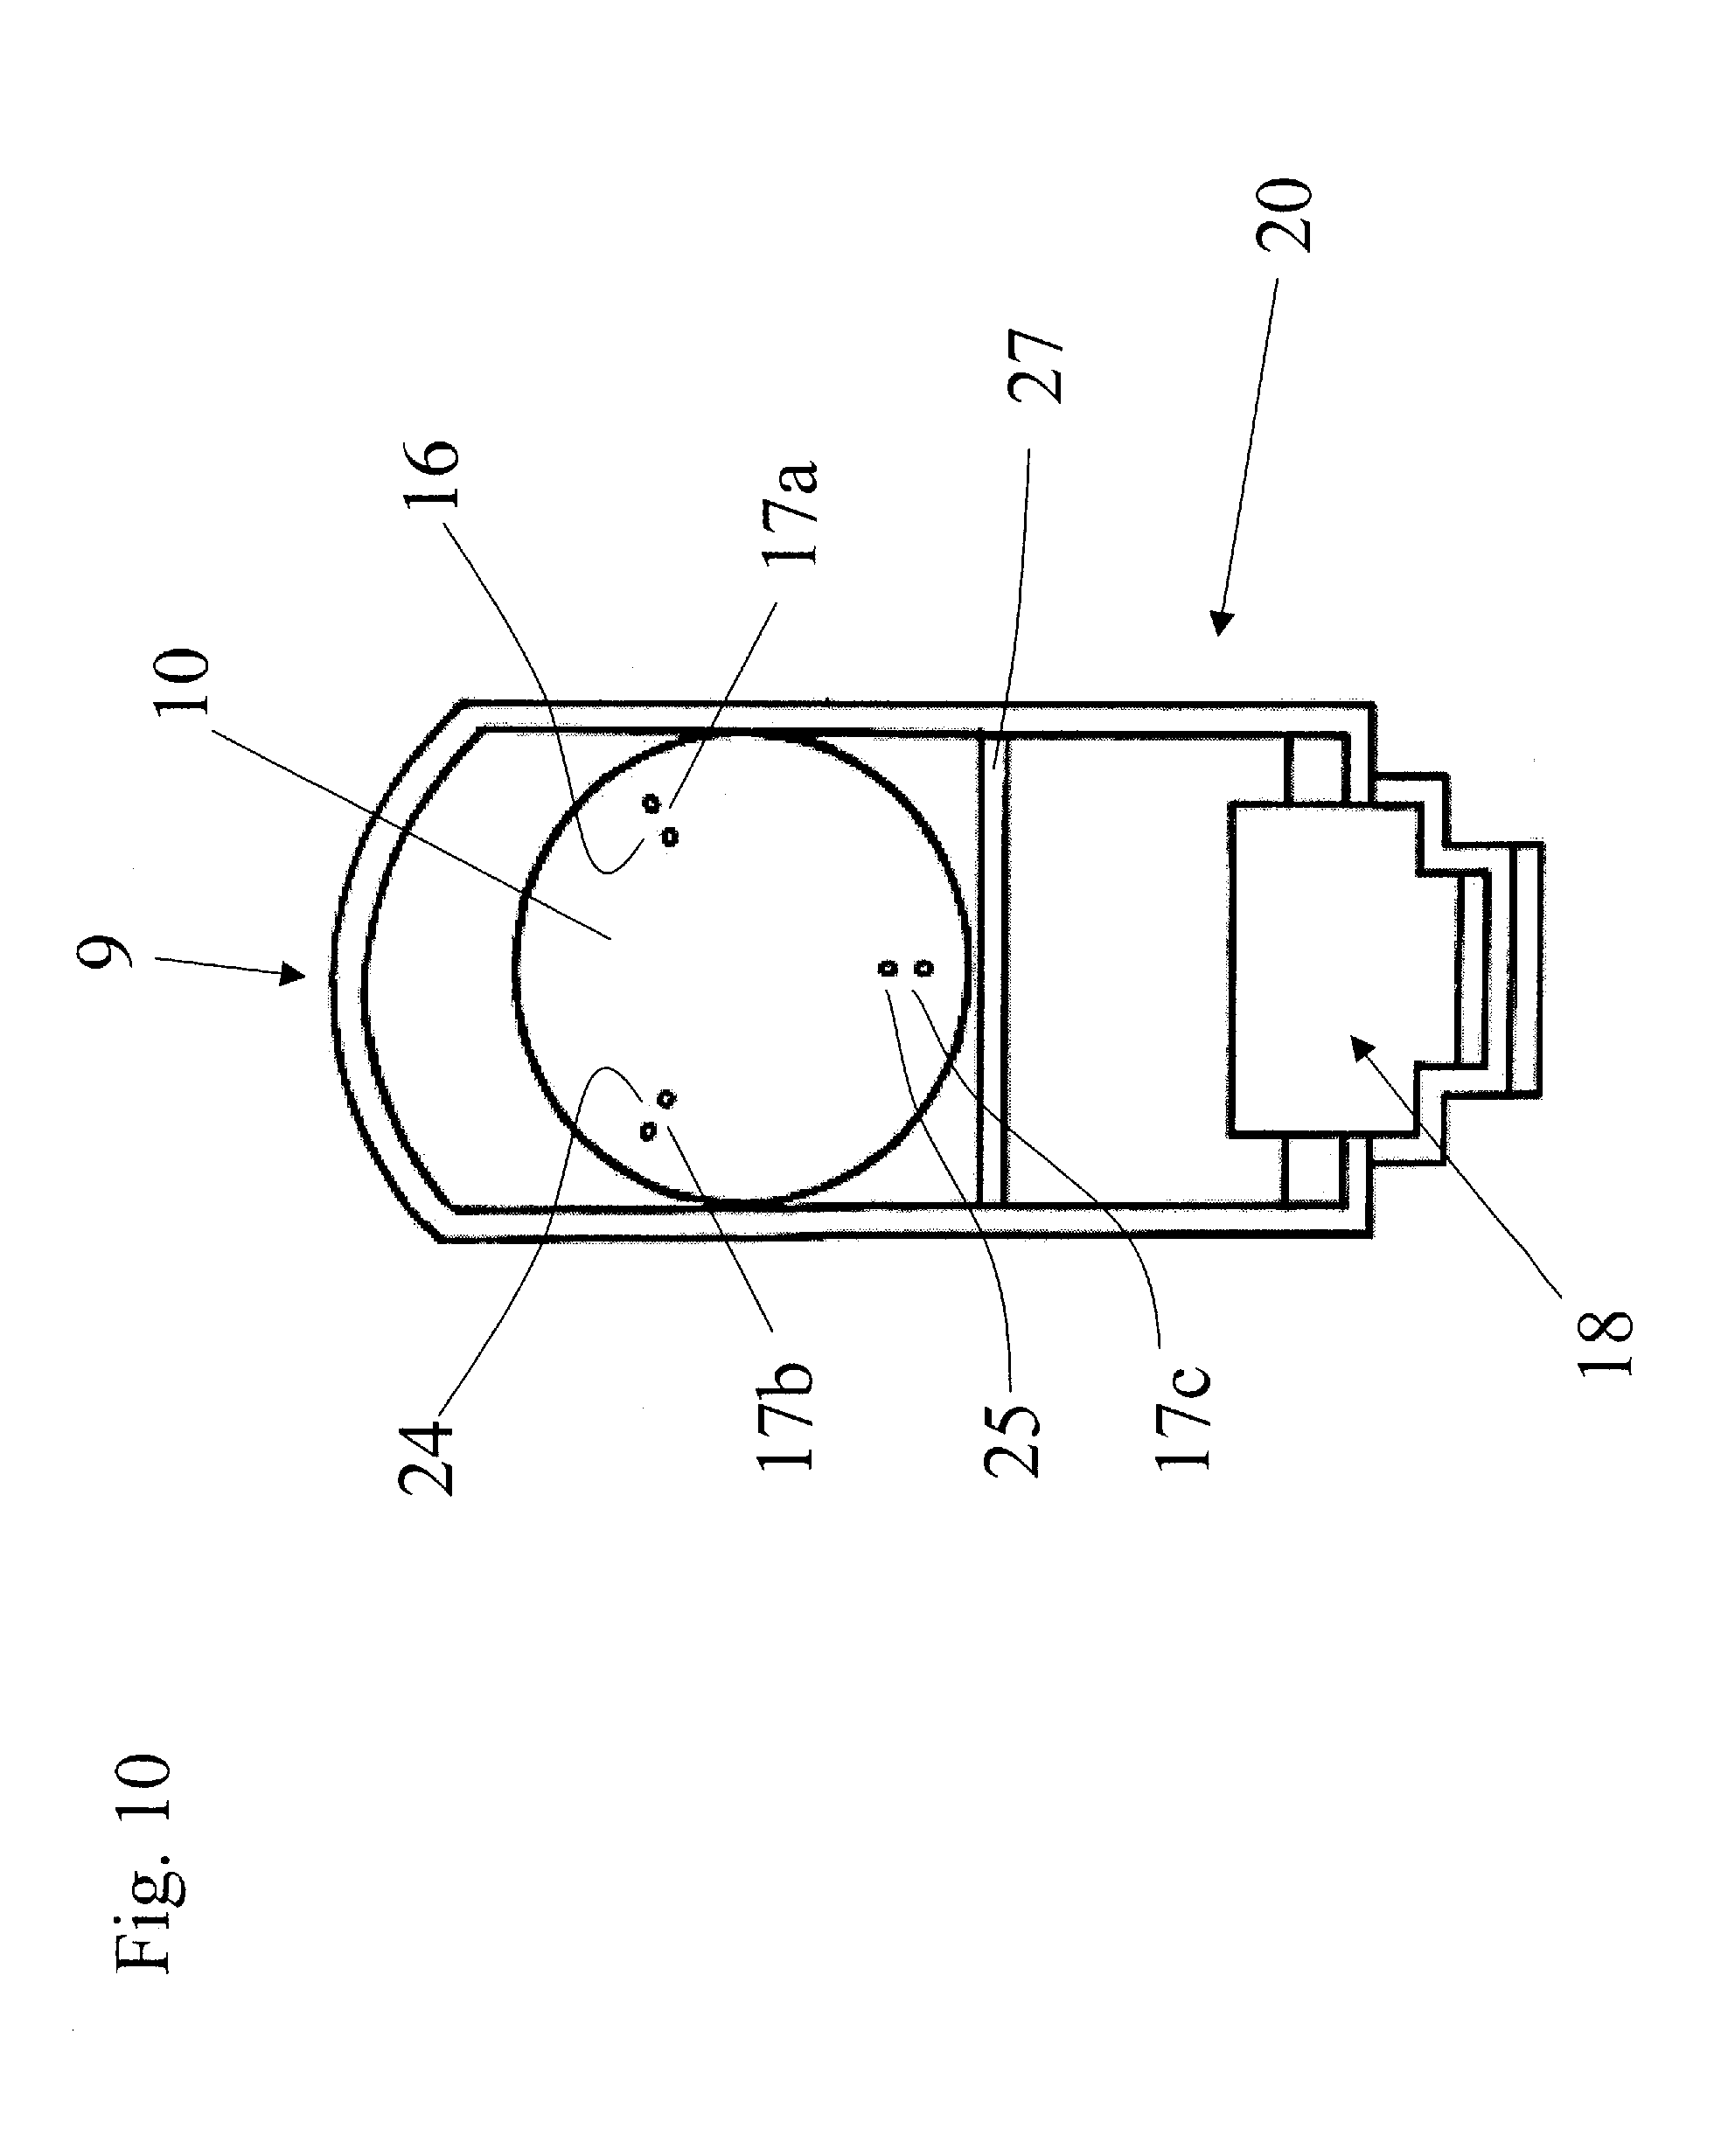 Rj12 Wiring Standard Rj12 Free Engine Image For User